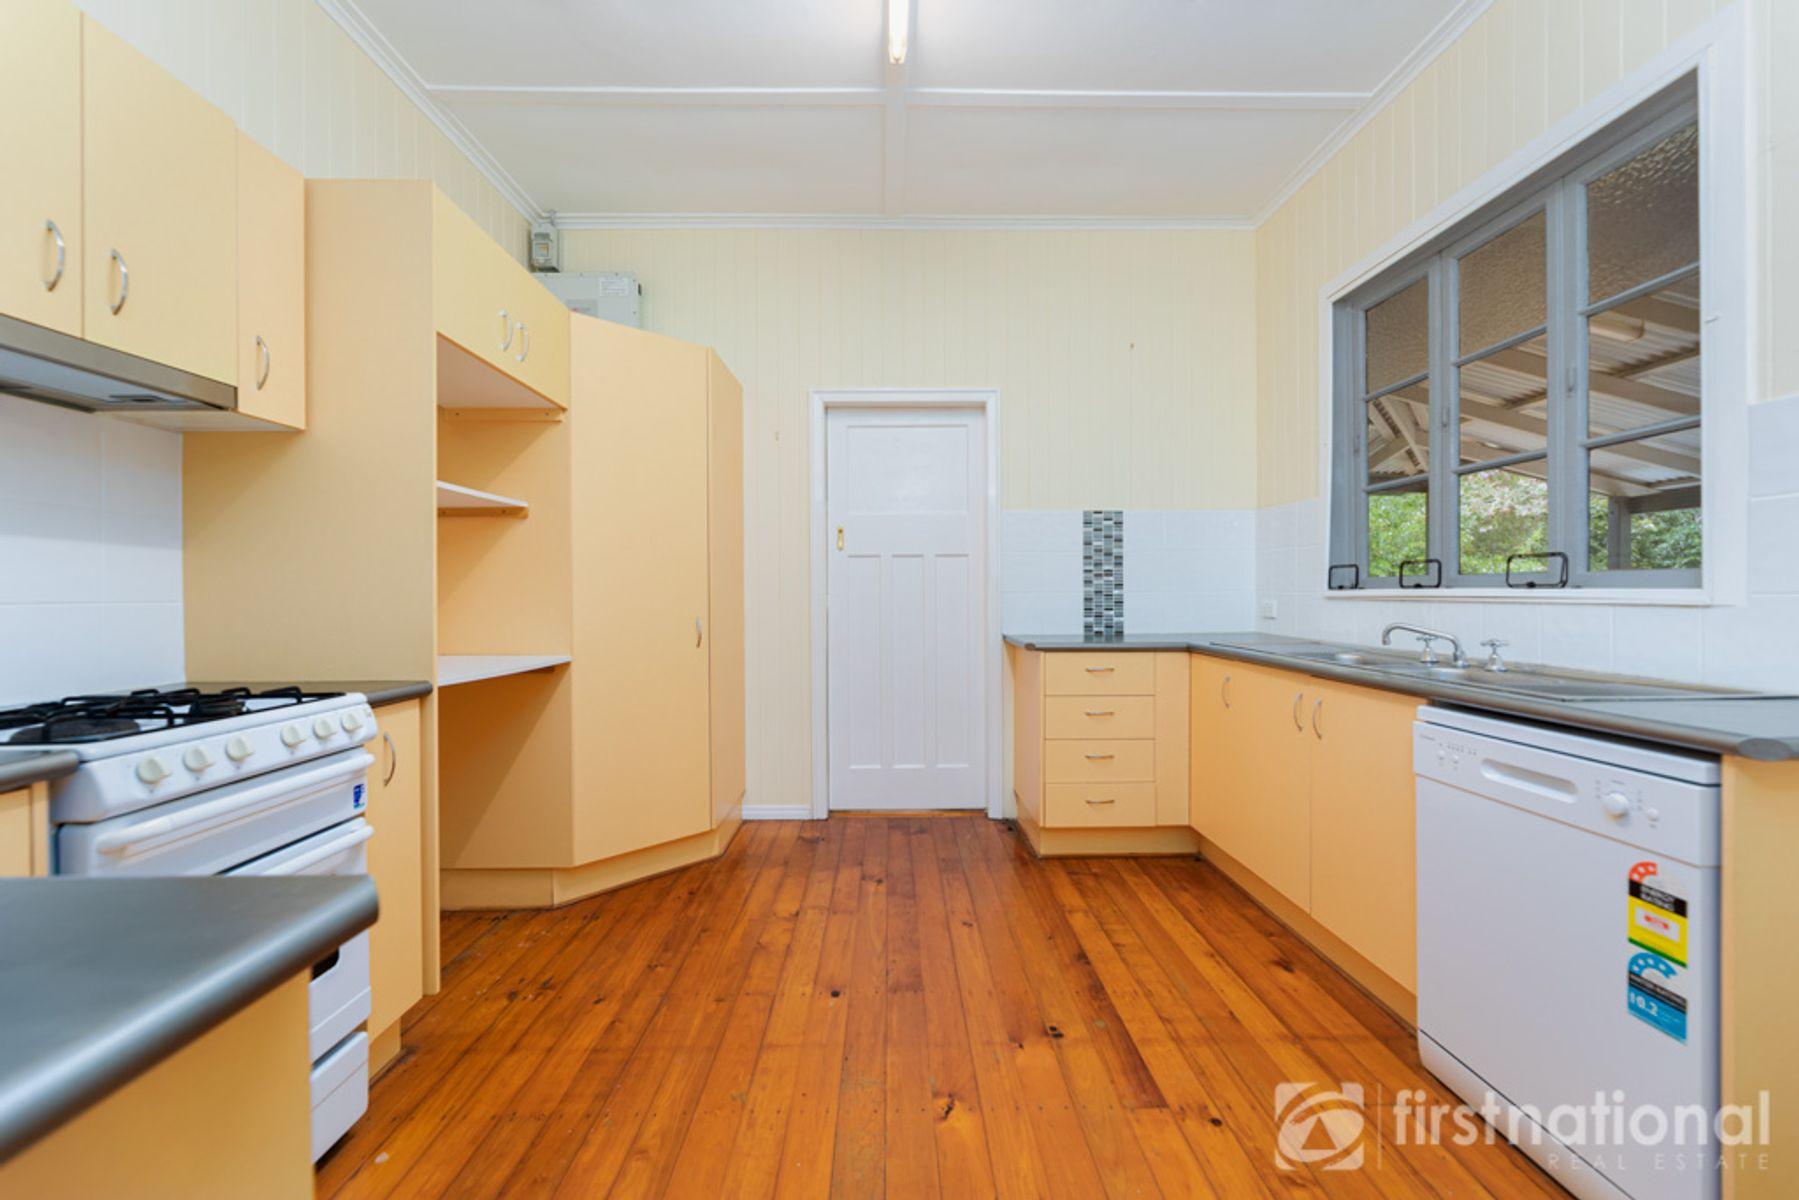 74 Baker Finch Avenue, Peachester, QLD 4519